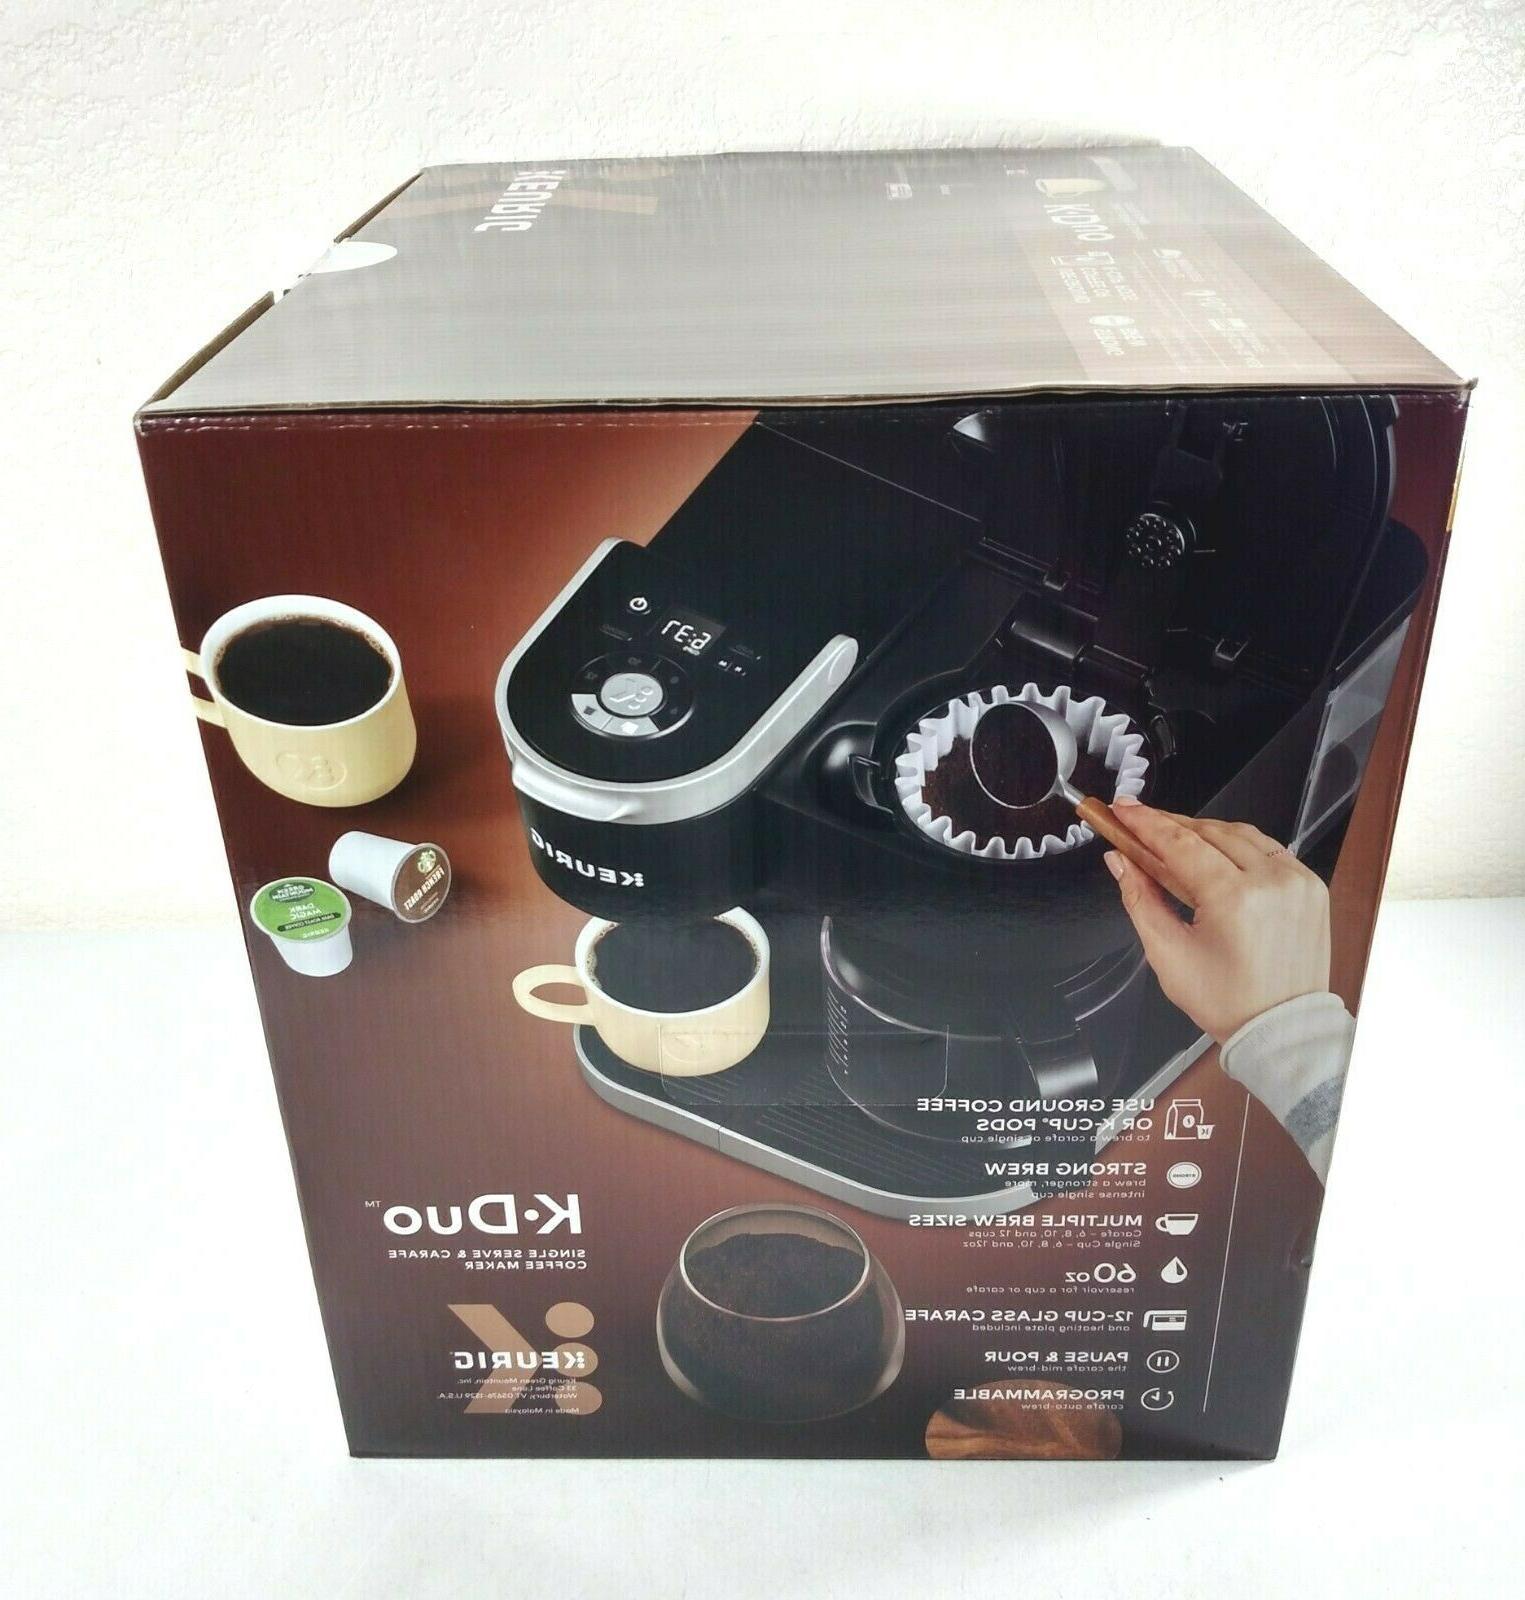 Keurig K-Duo Maker, Single Serve Carafe Coffee